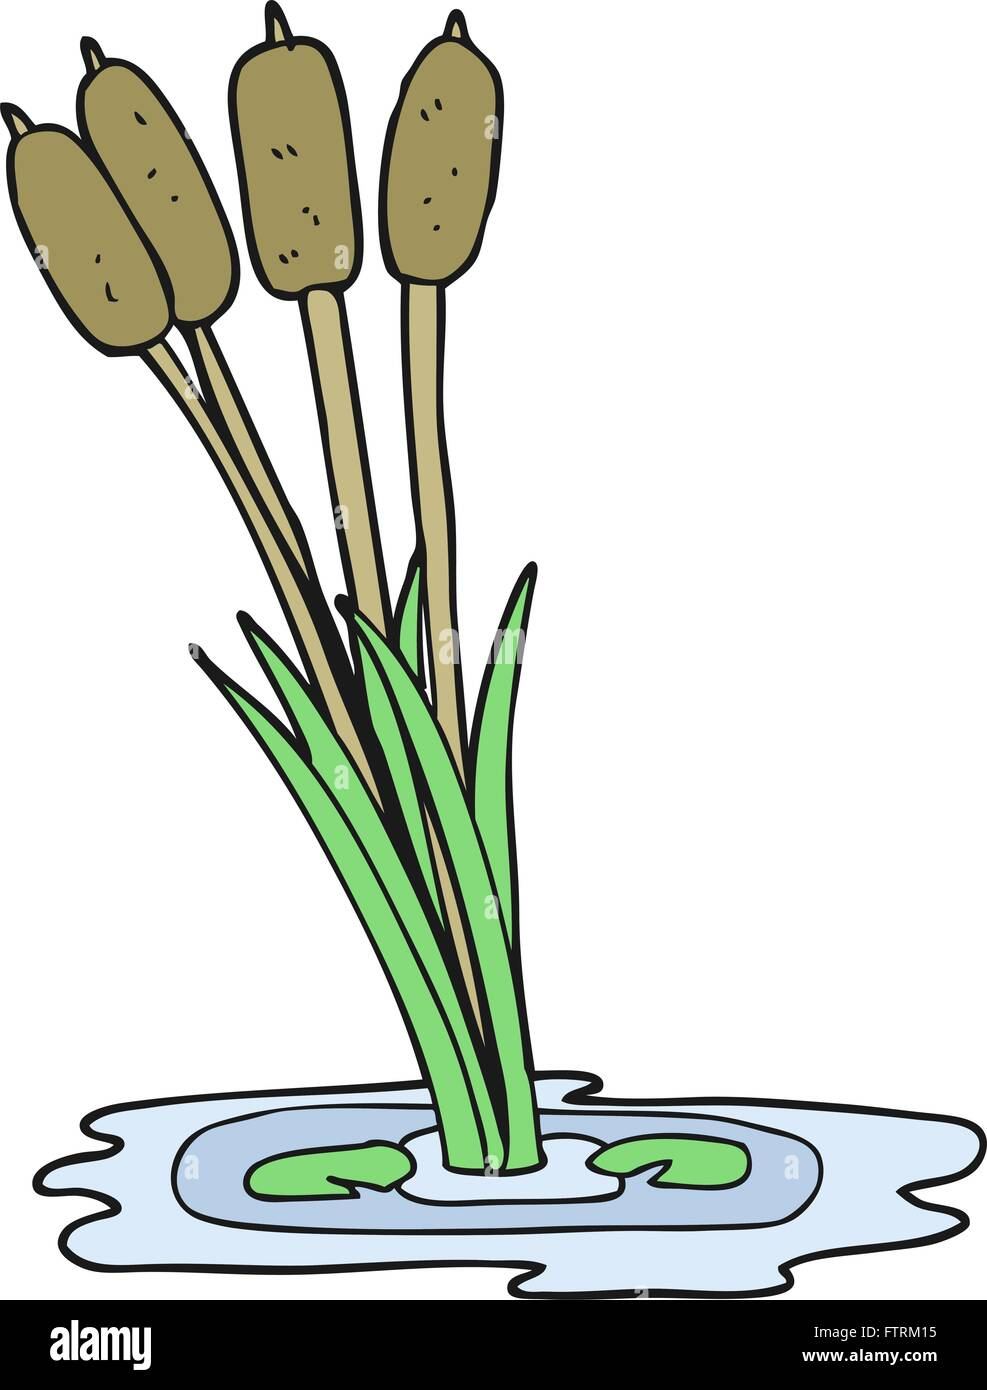 freehand drawn cartoon reeds stock vector art u0026 illustration